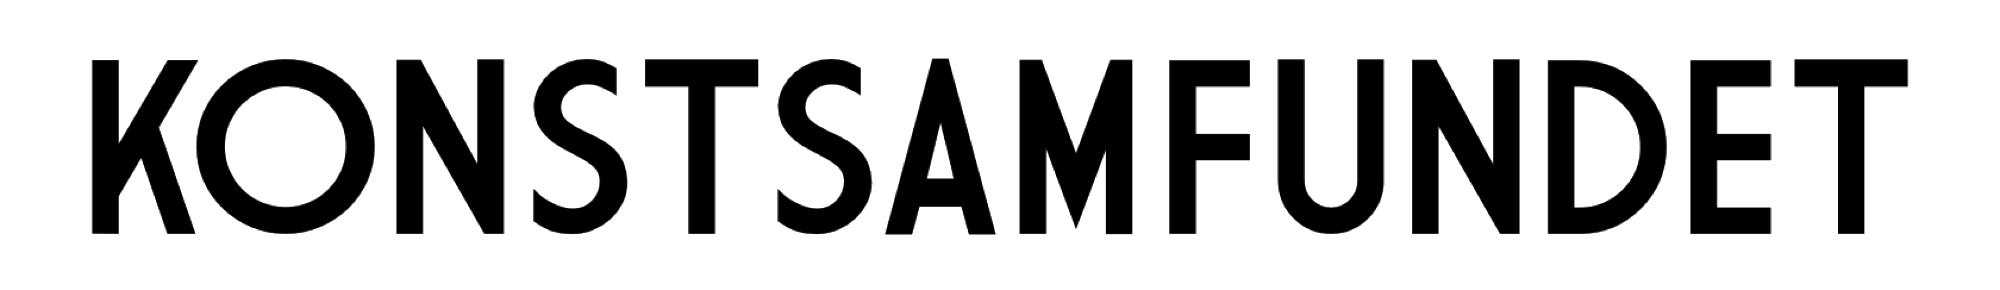 Konstsamfundet logo